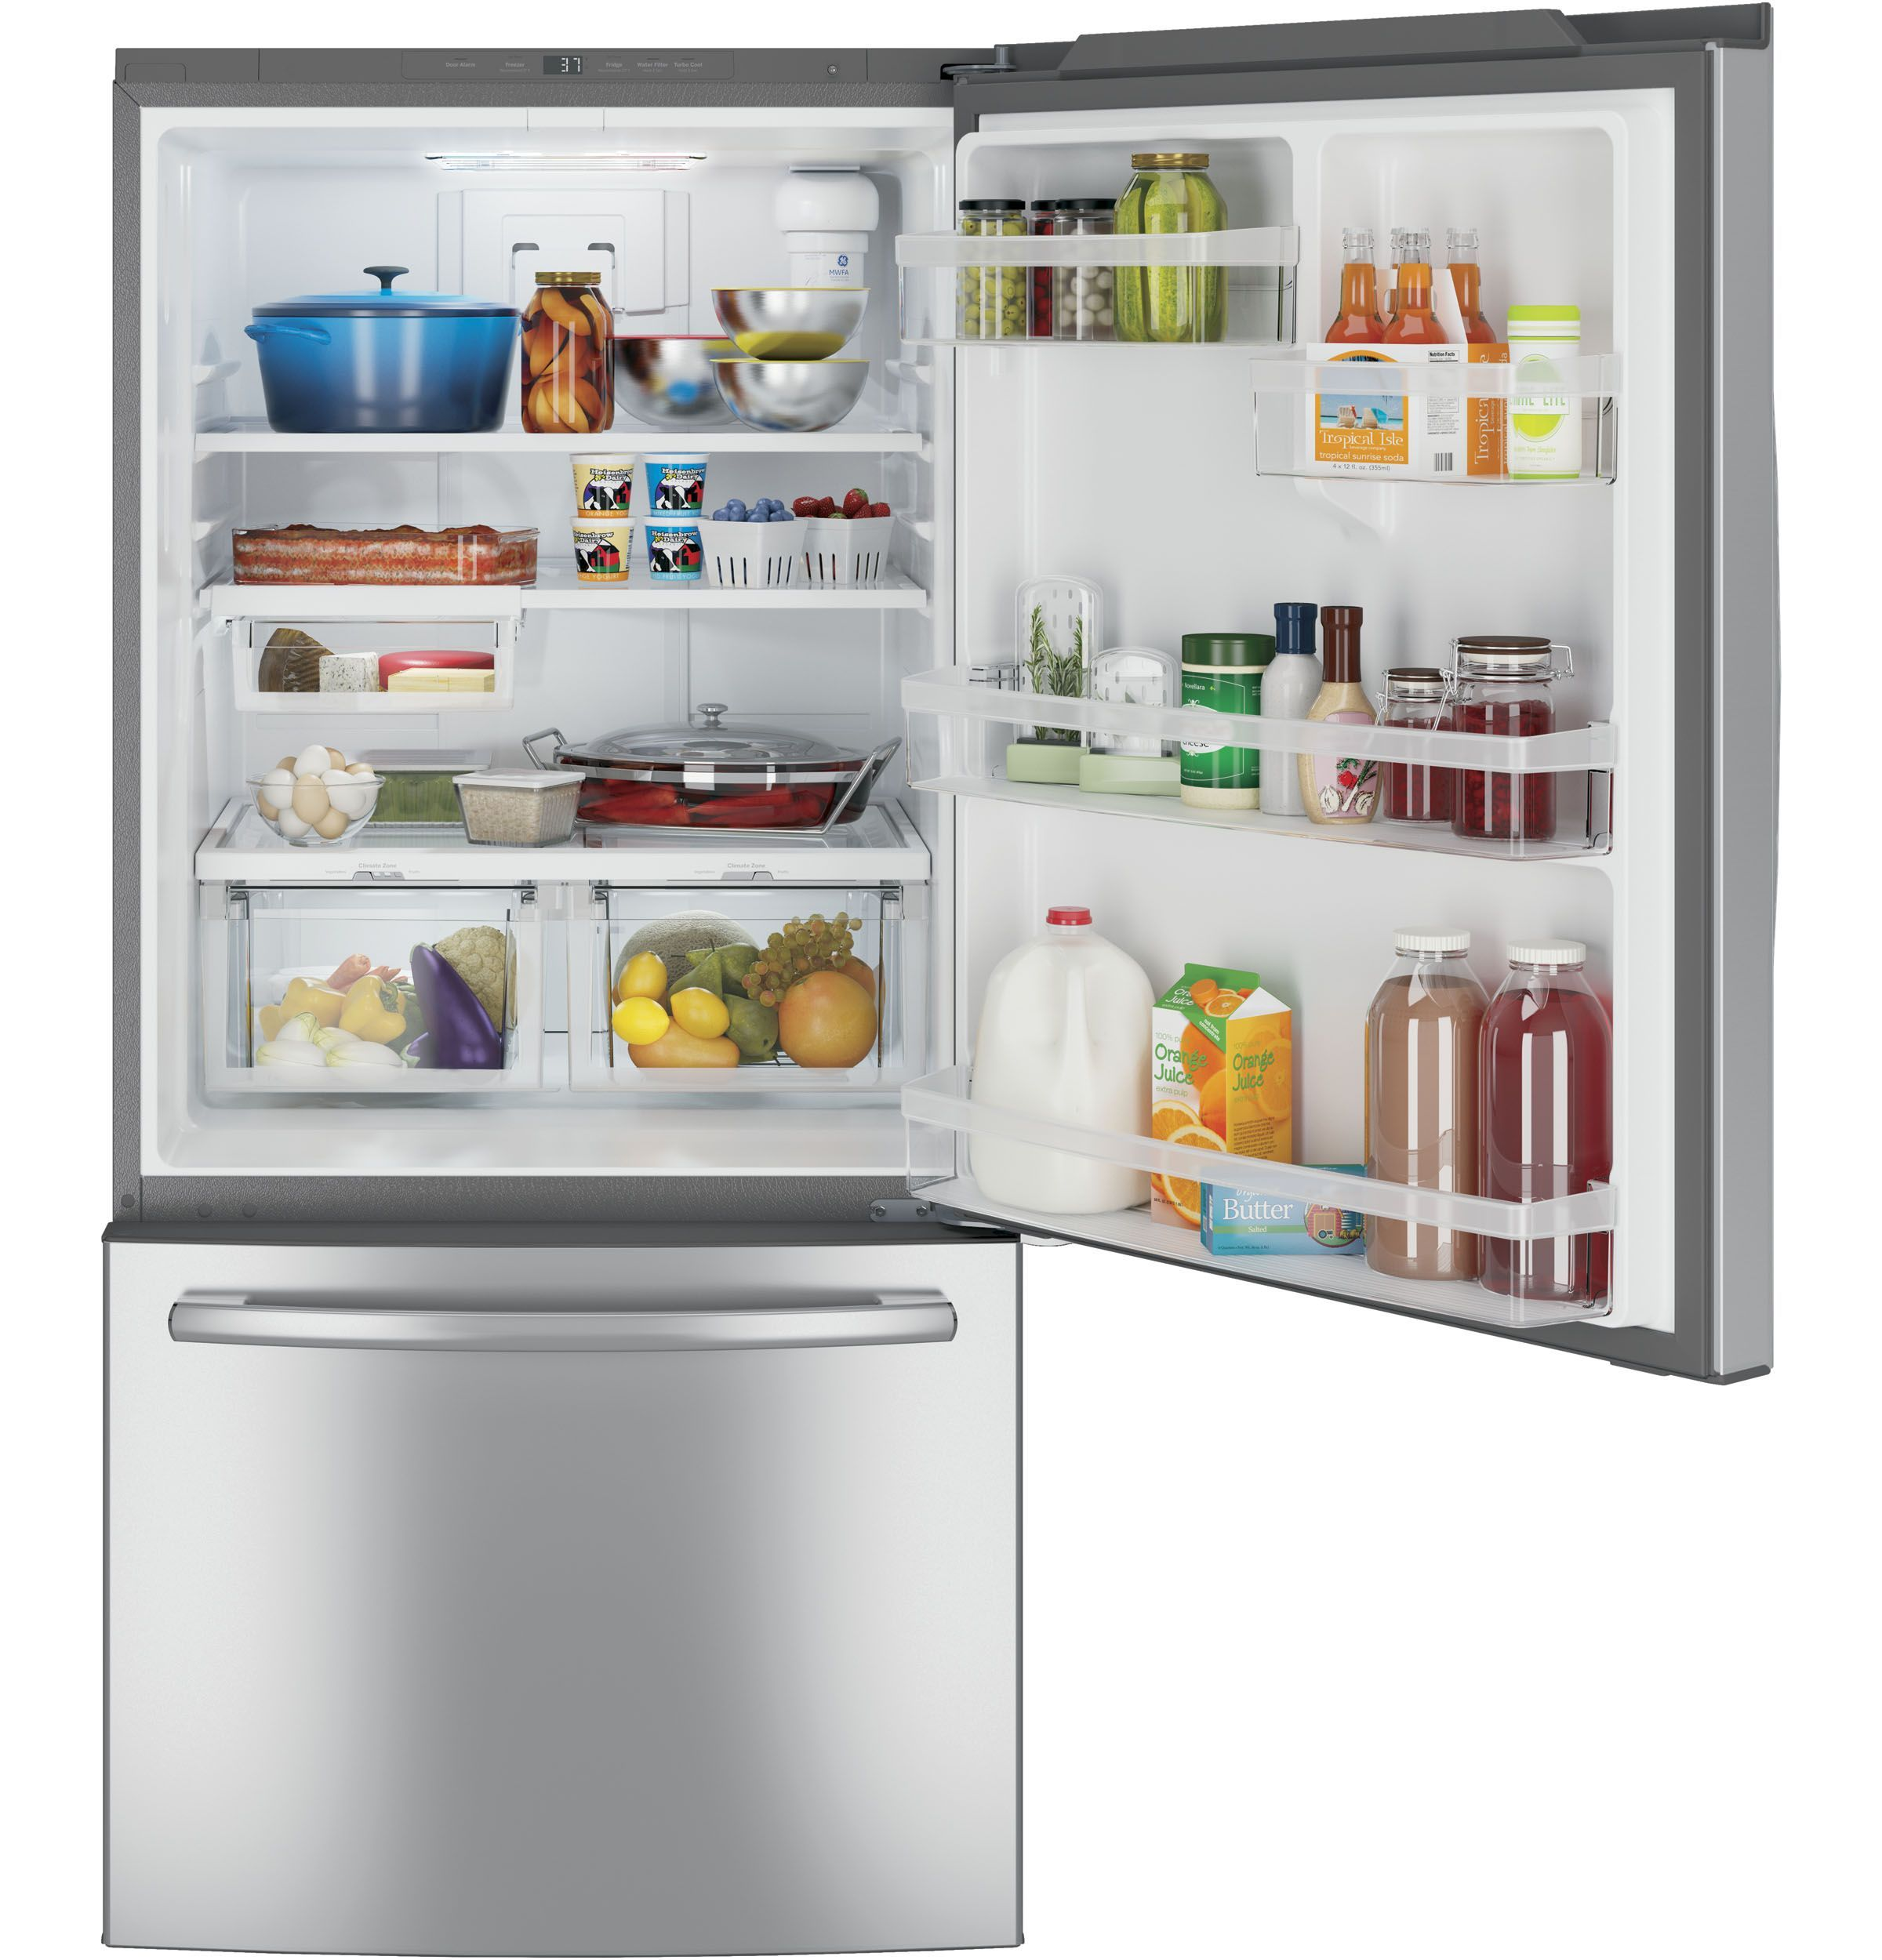 GE ENERGY STAR 24 9 Cu Ft Bottom Freezer Drawer Refrigerator